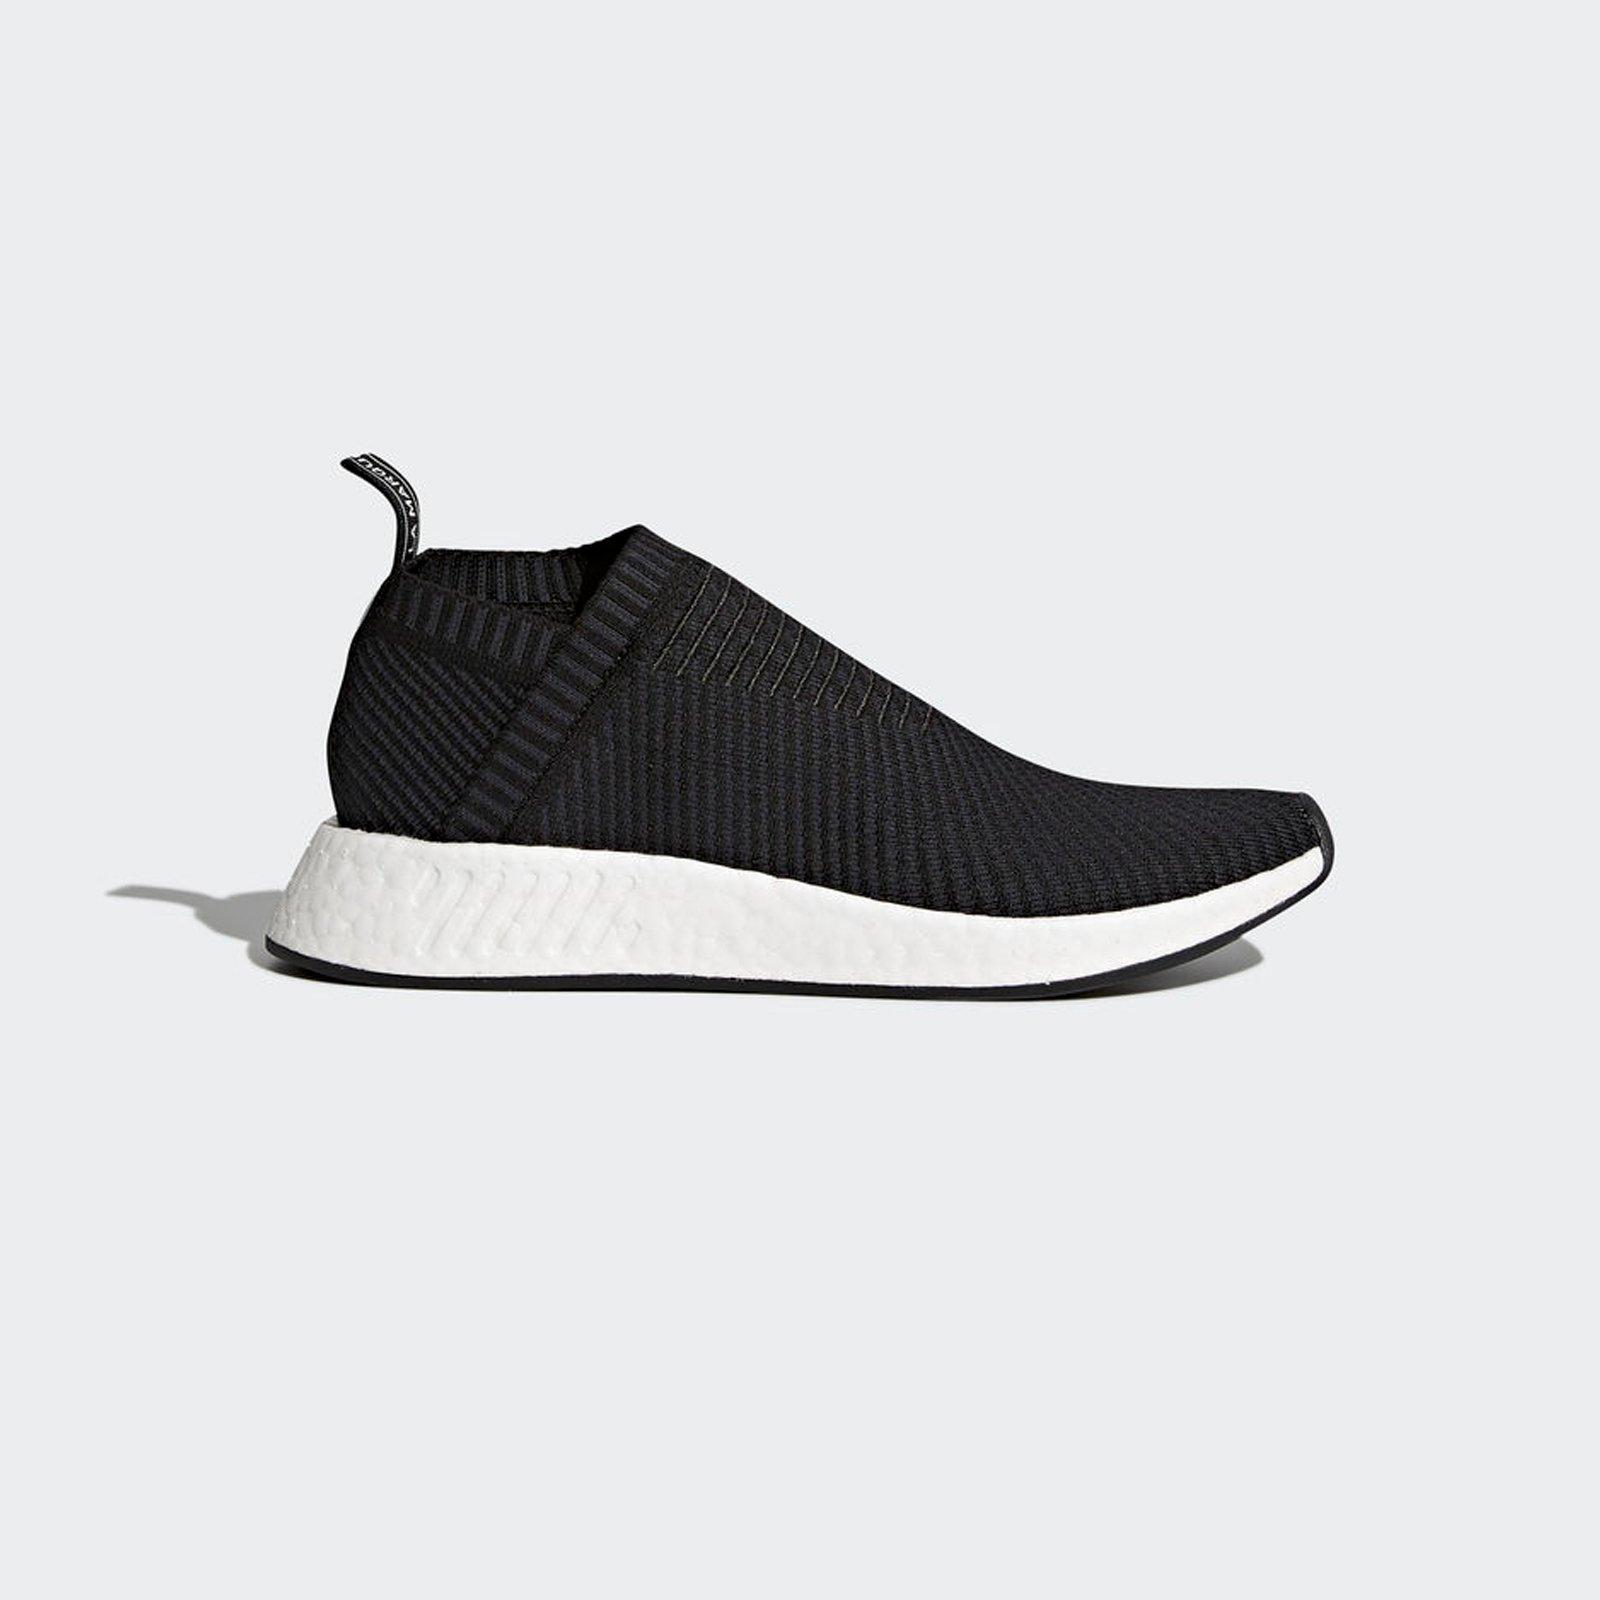 22fd296fbf32 adidas NMD CS2 PK - Cq2372 - Sneakersnstuff